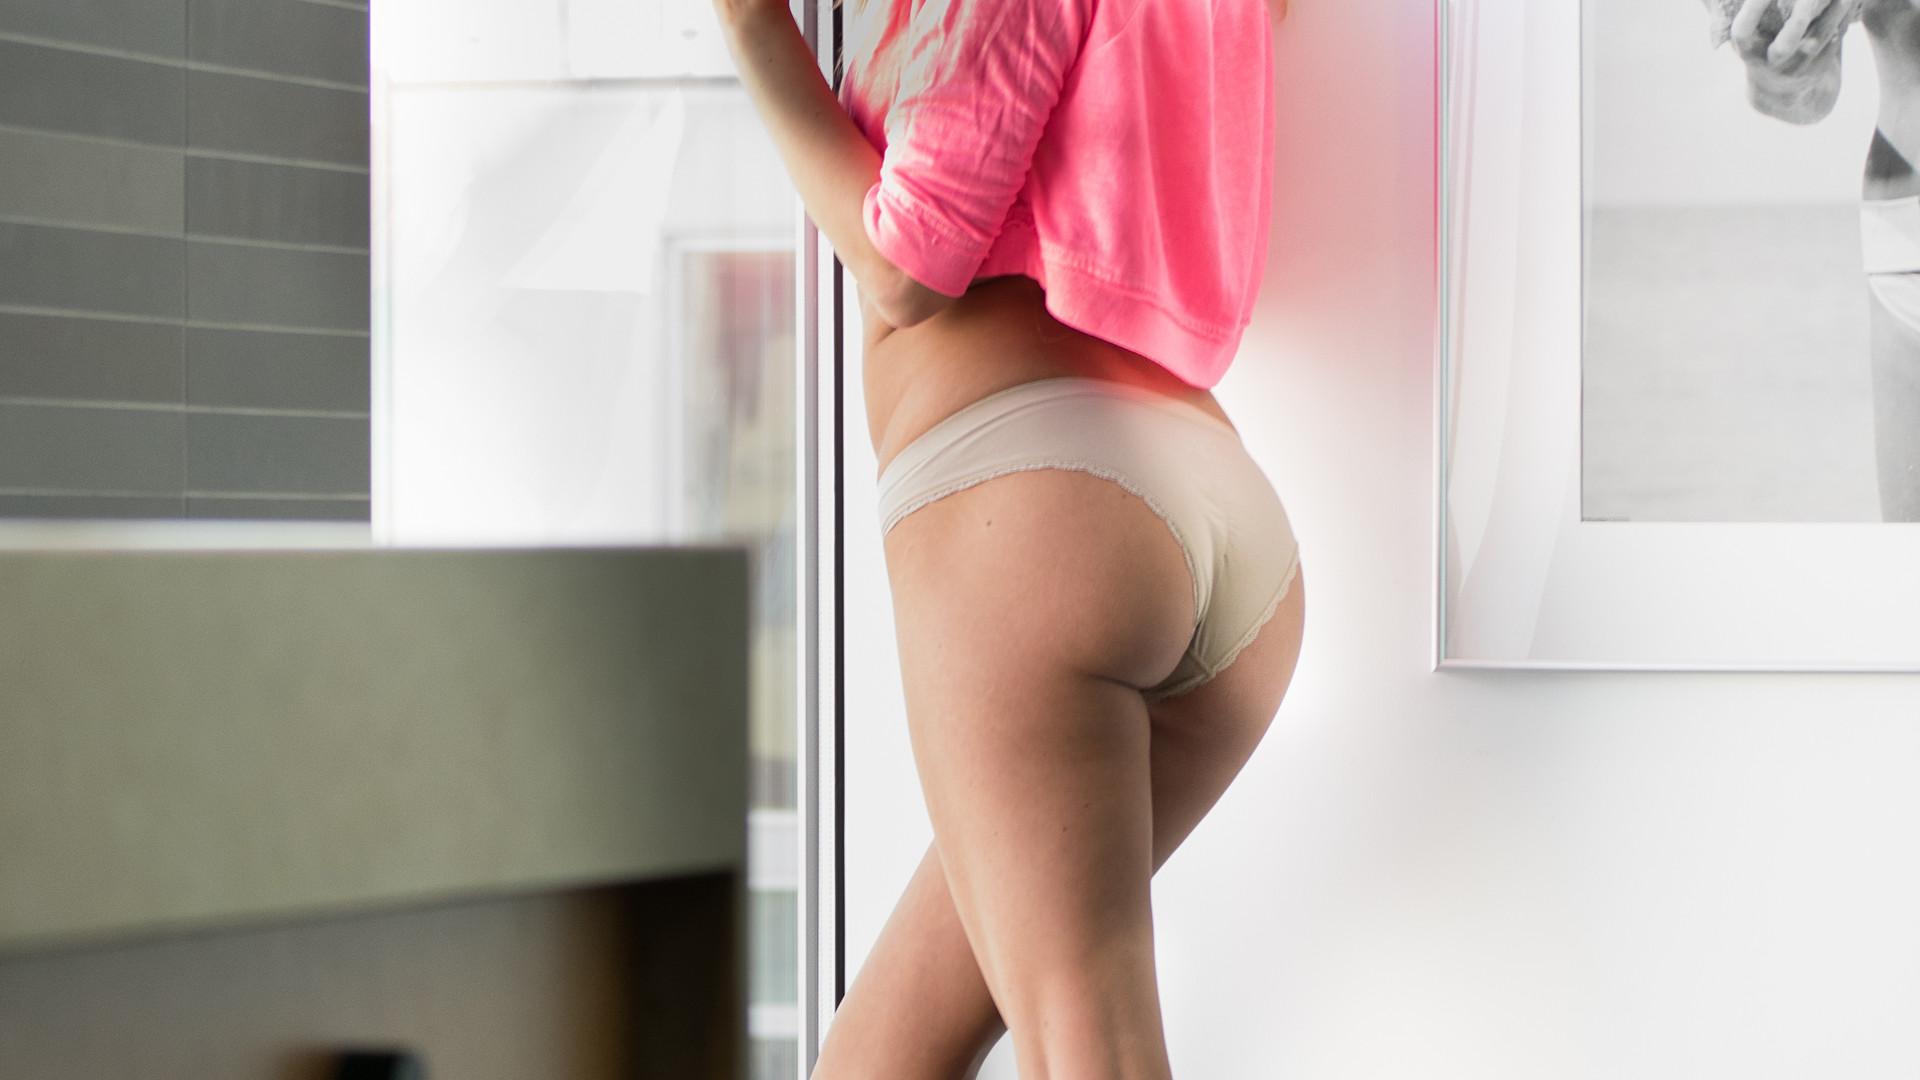 Aimee Fogelman